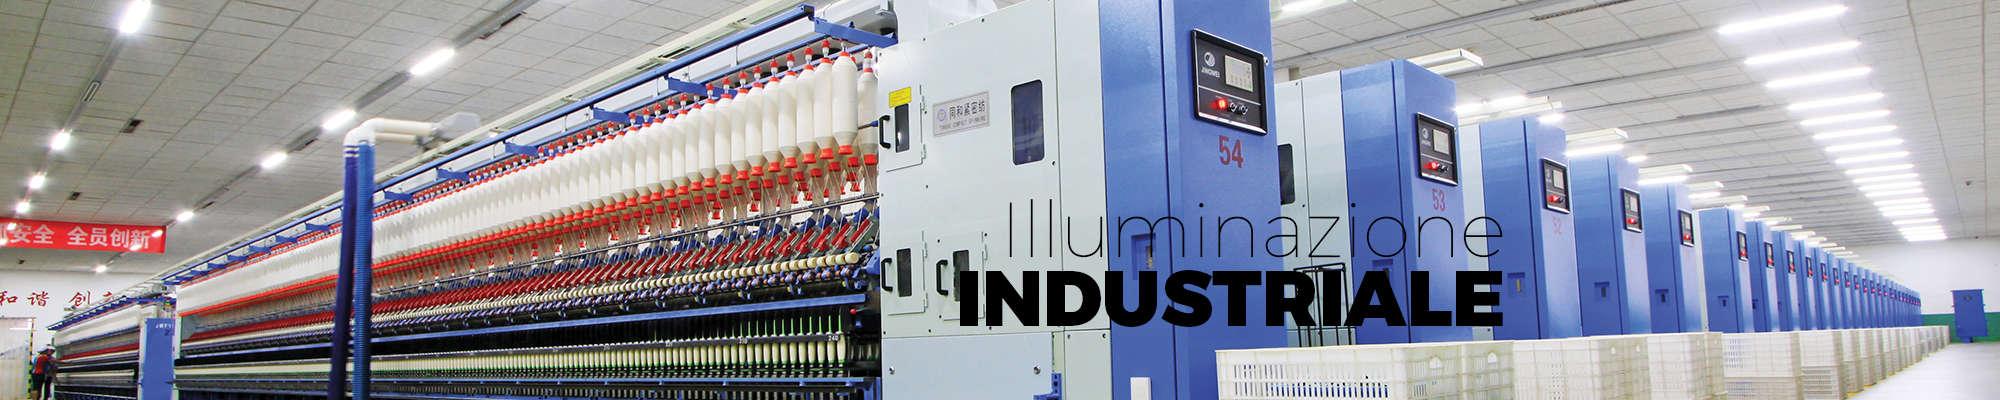 illuminazione-industriale